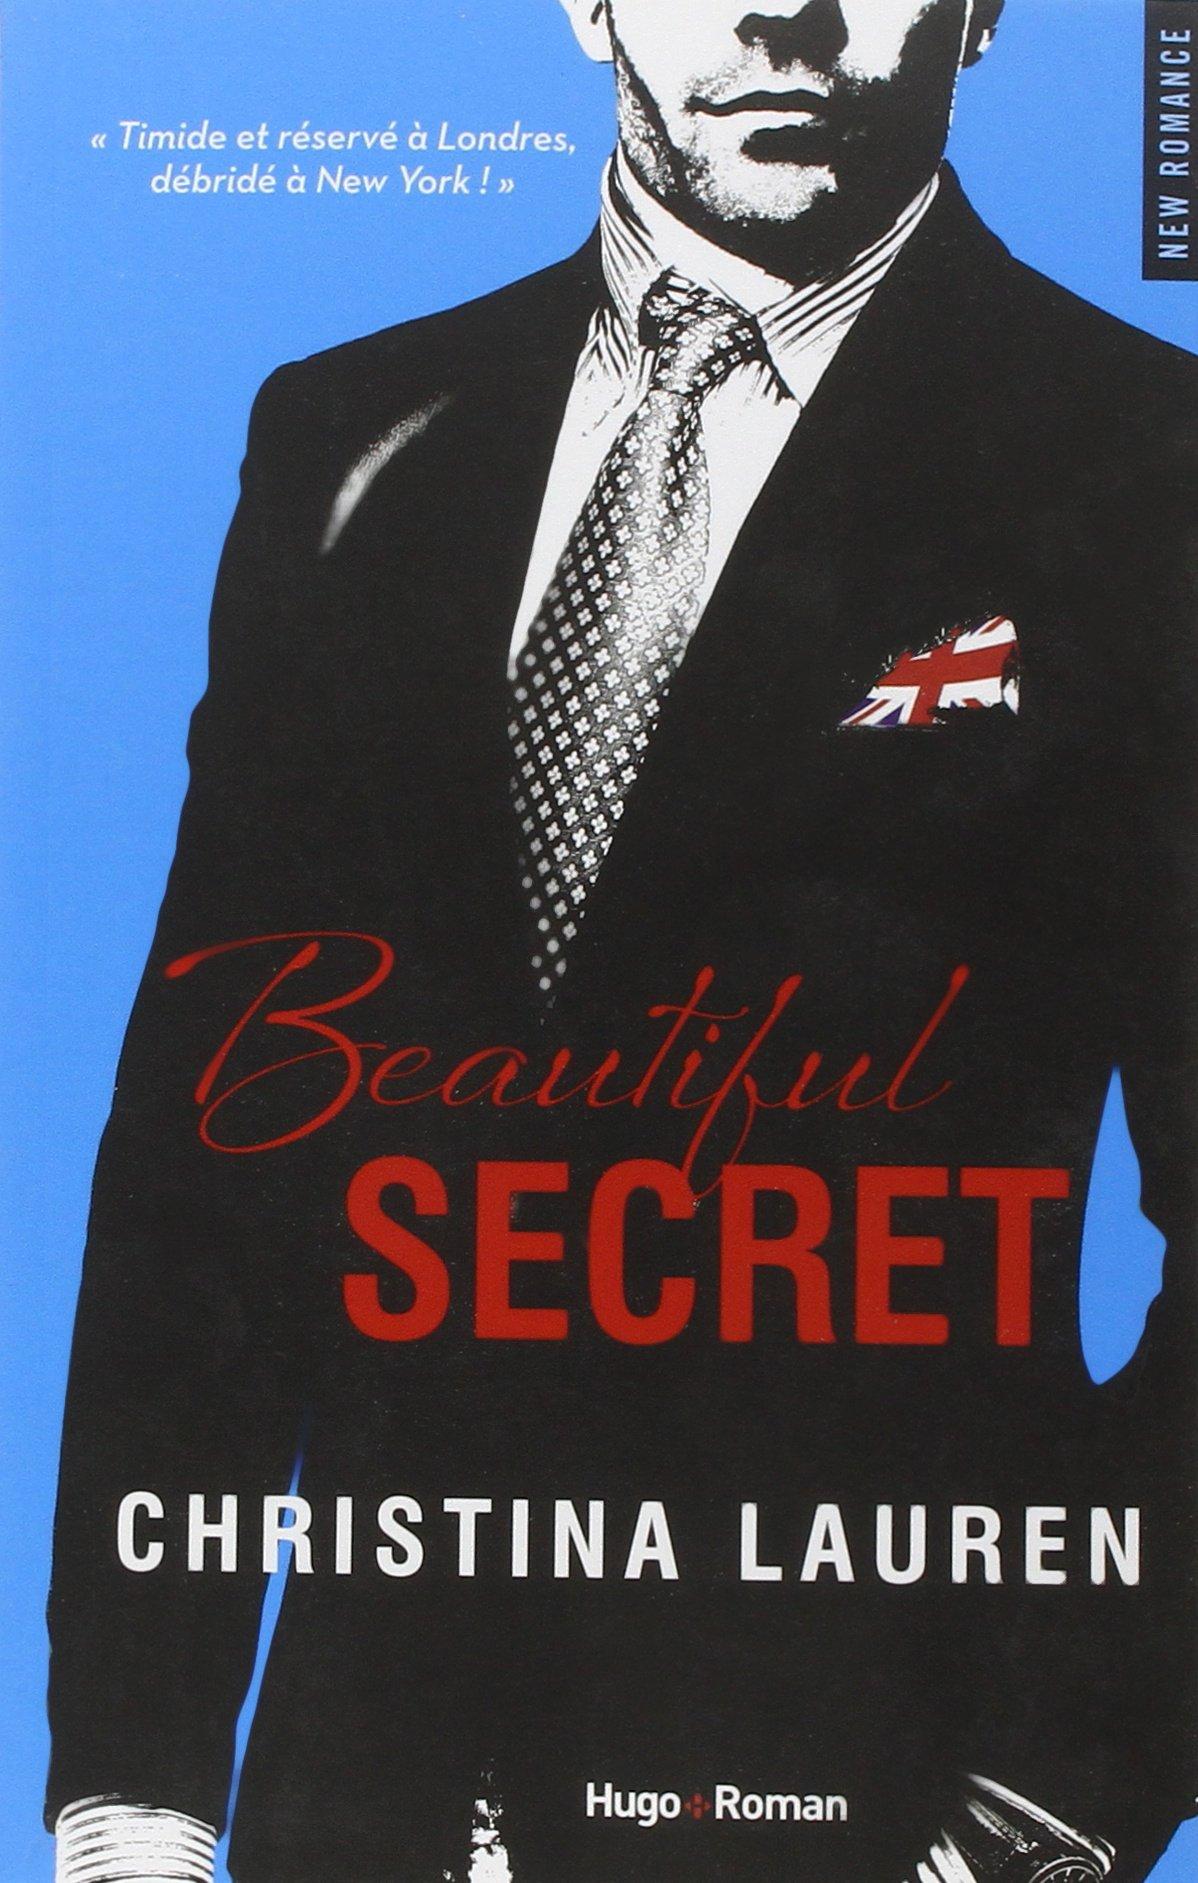 http://queenofreading1605.blogspot.be/2015/04/beautiful-tome-4-beautiful-secret-de.html